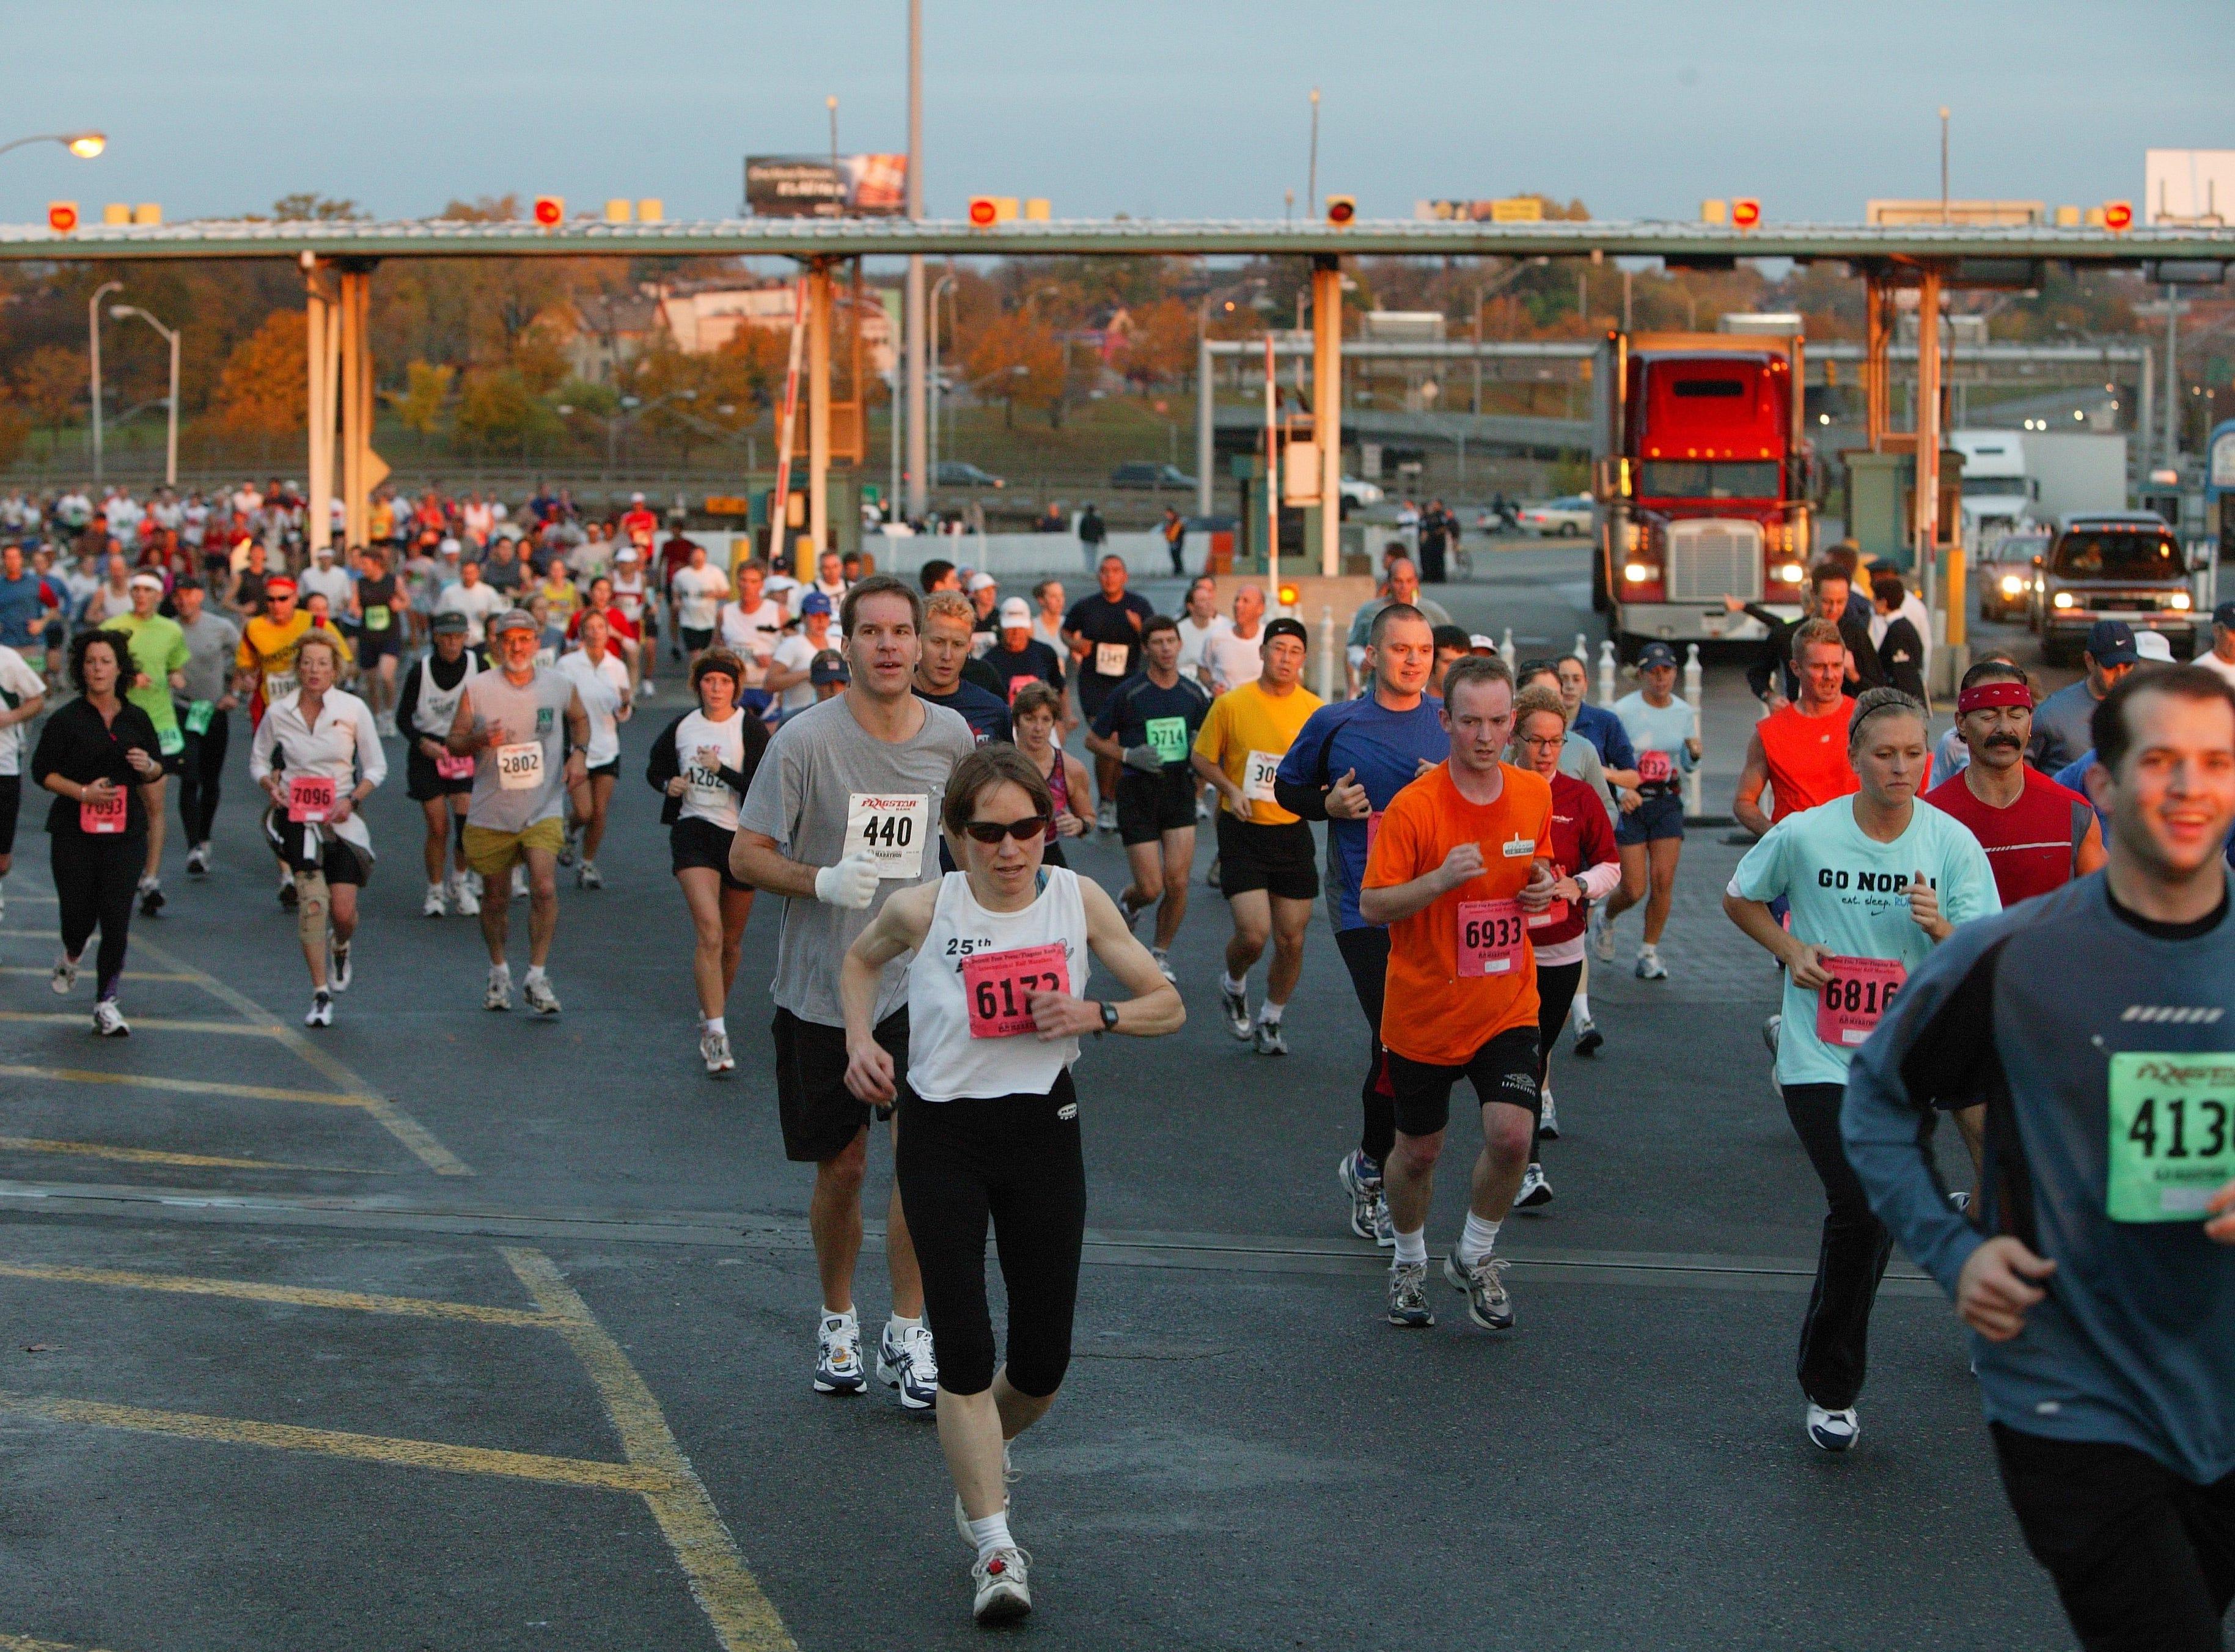 27th Annual Detroit Free Press Marathon on Sunday October 24th, 2004.